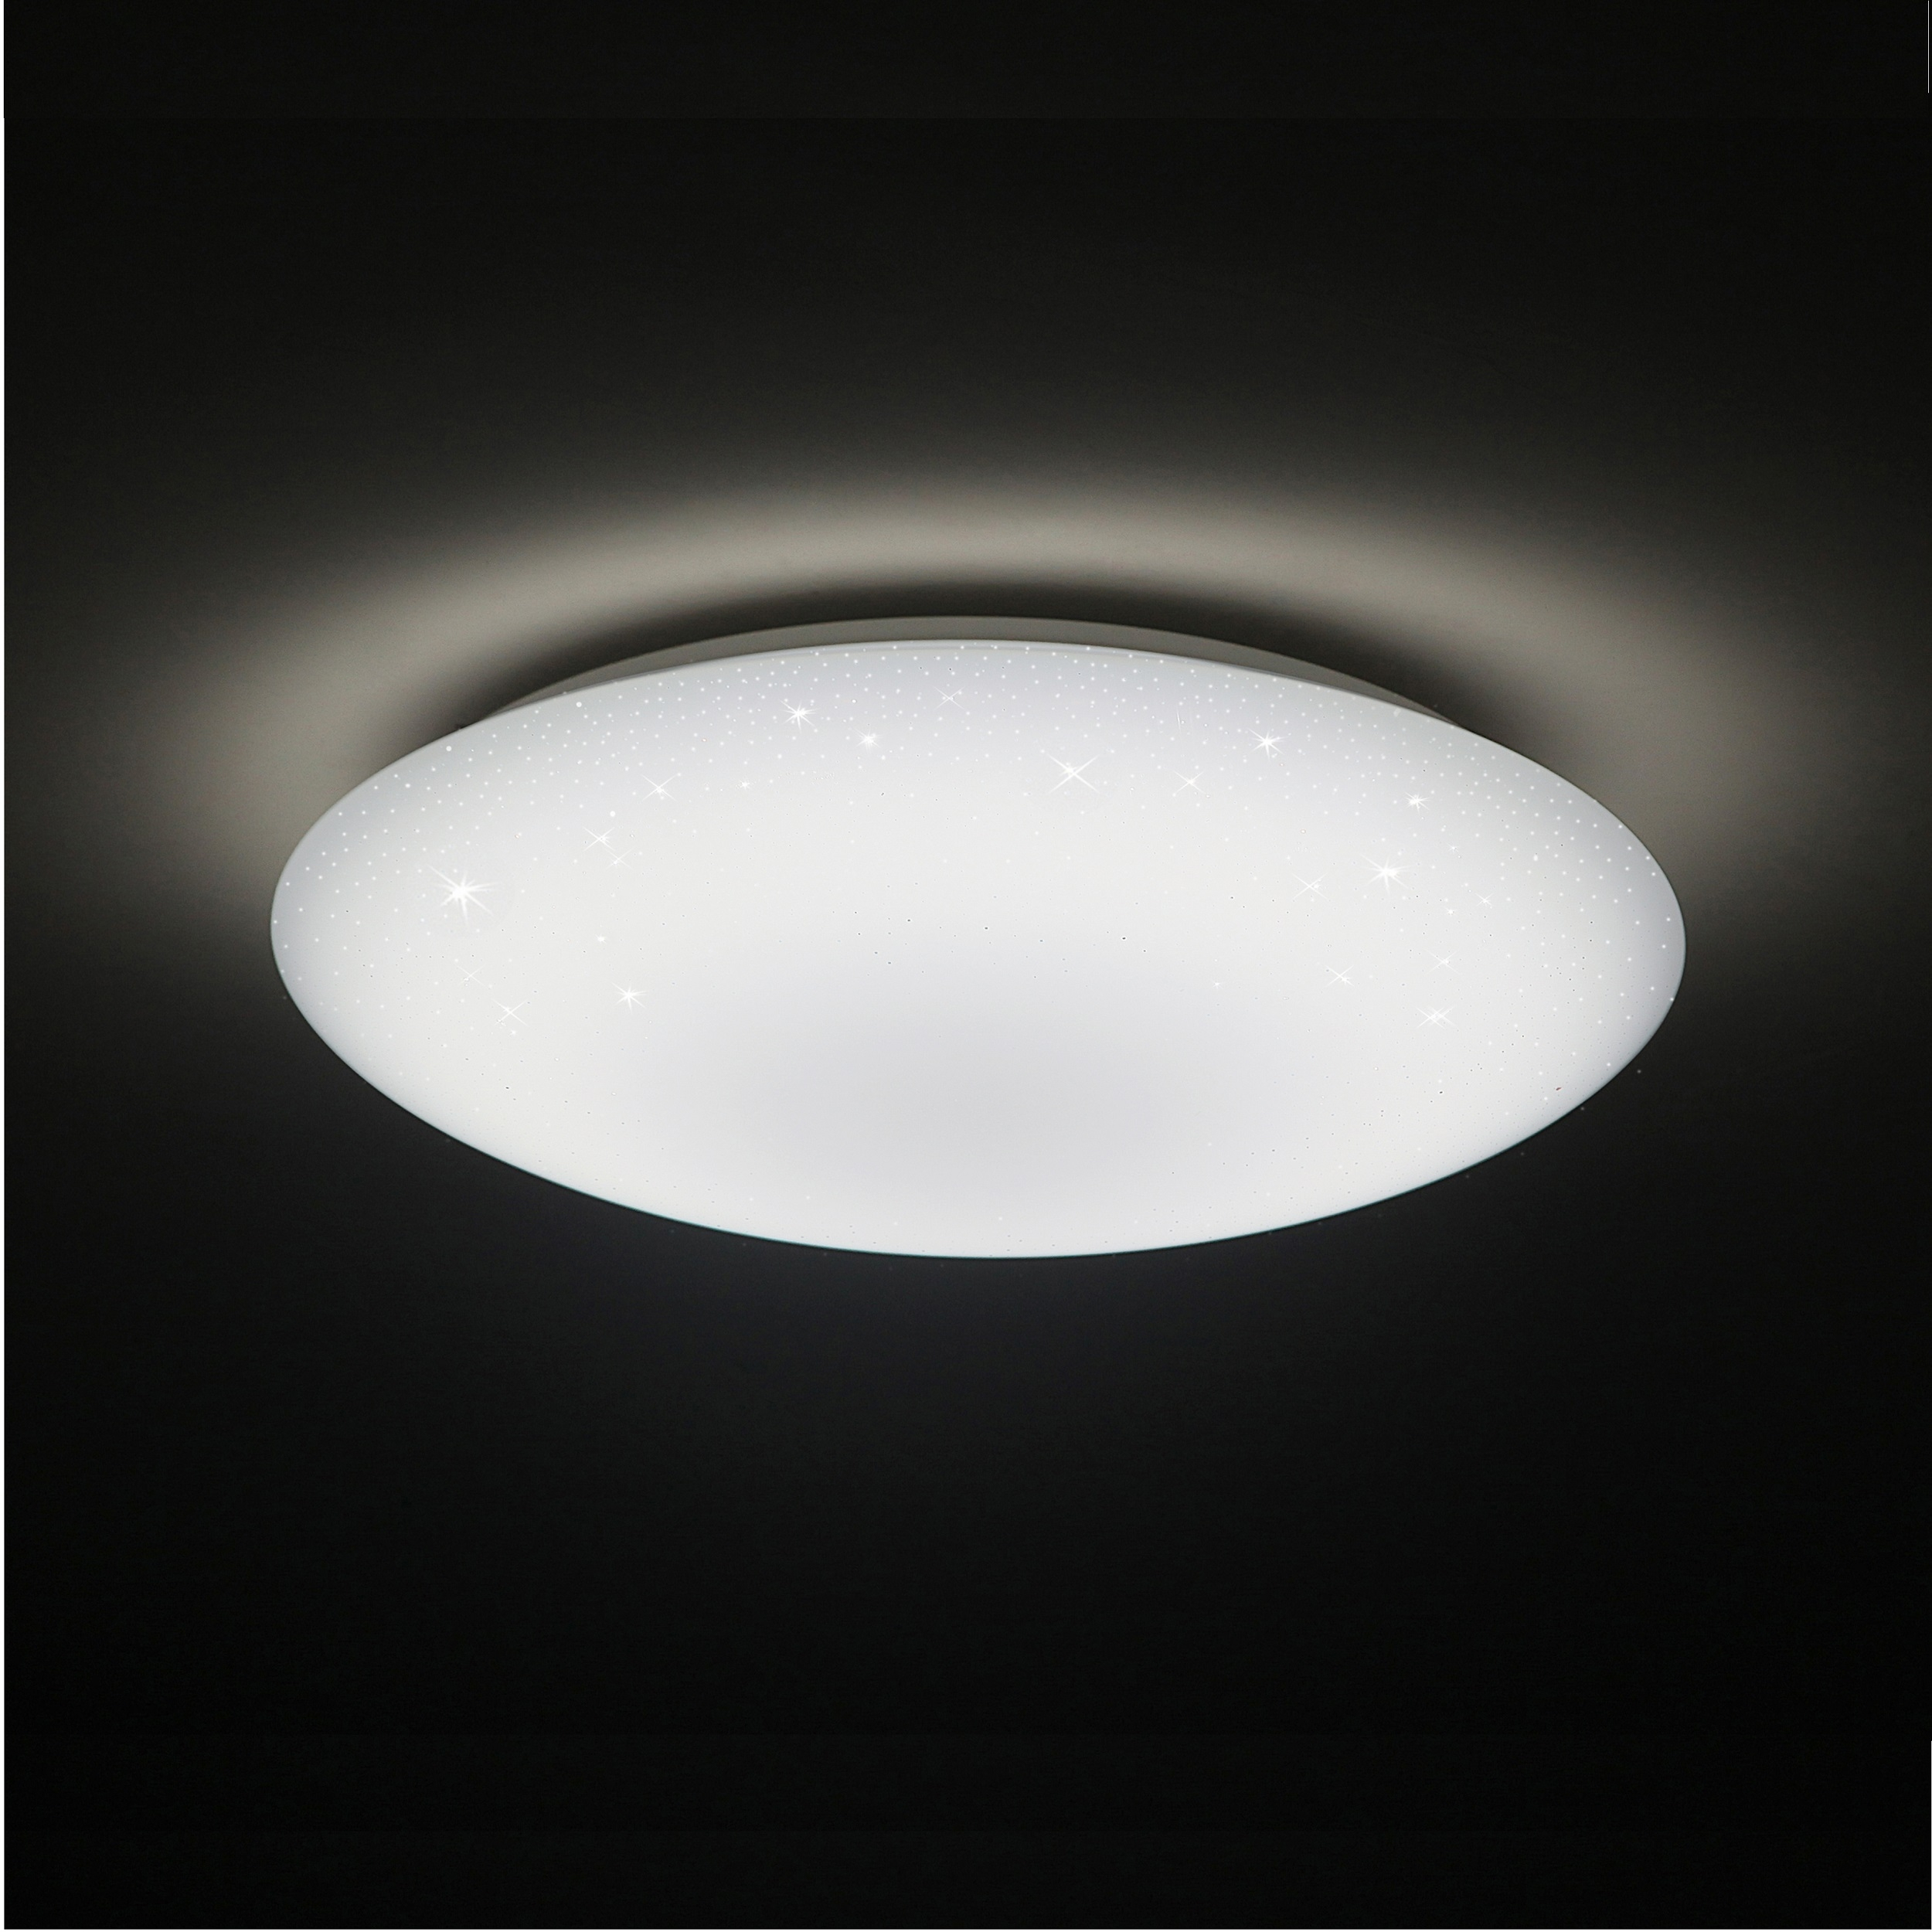 farrier save ll love flush semi mounts mount lighting ceiling you wayfair light